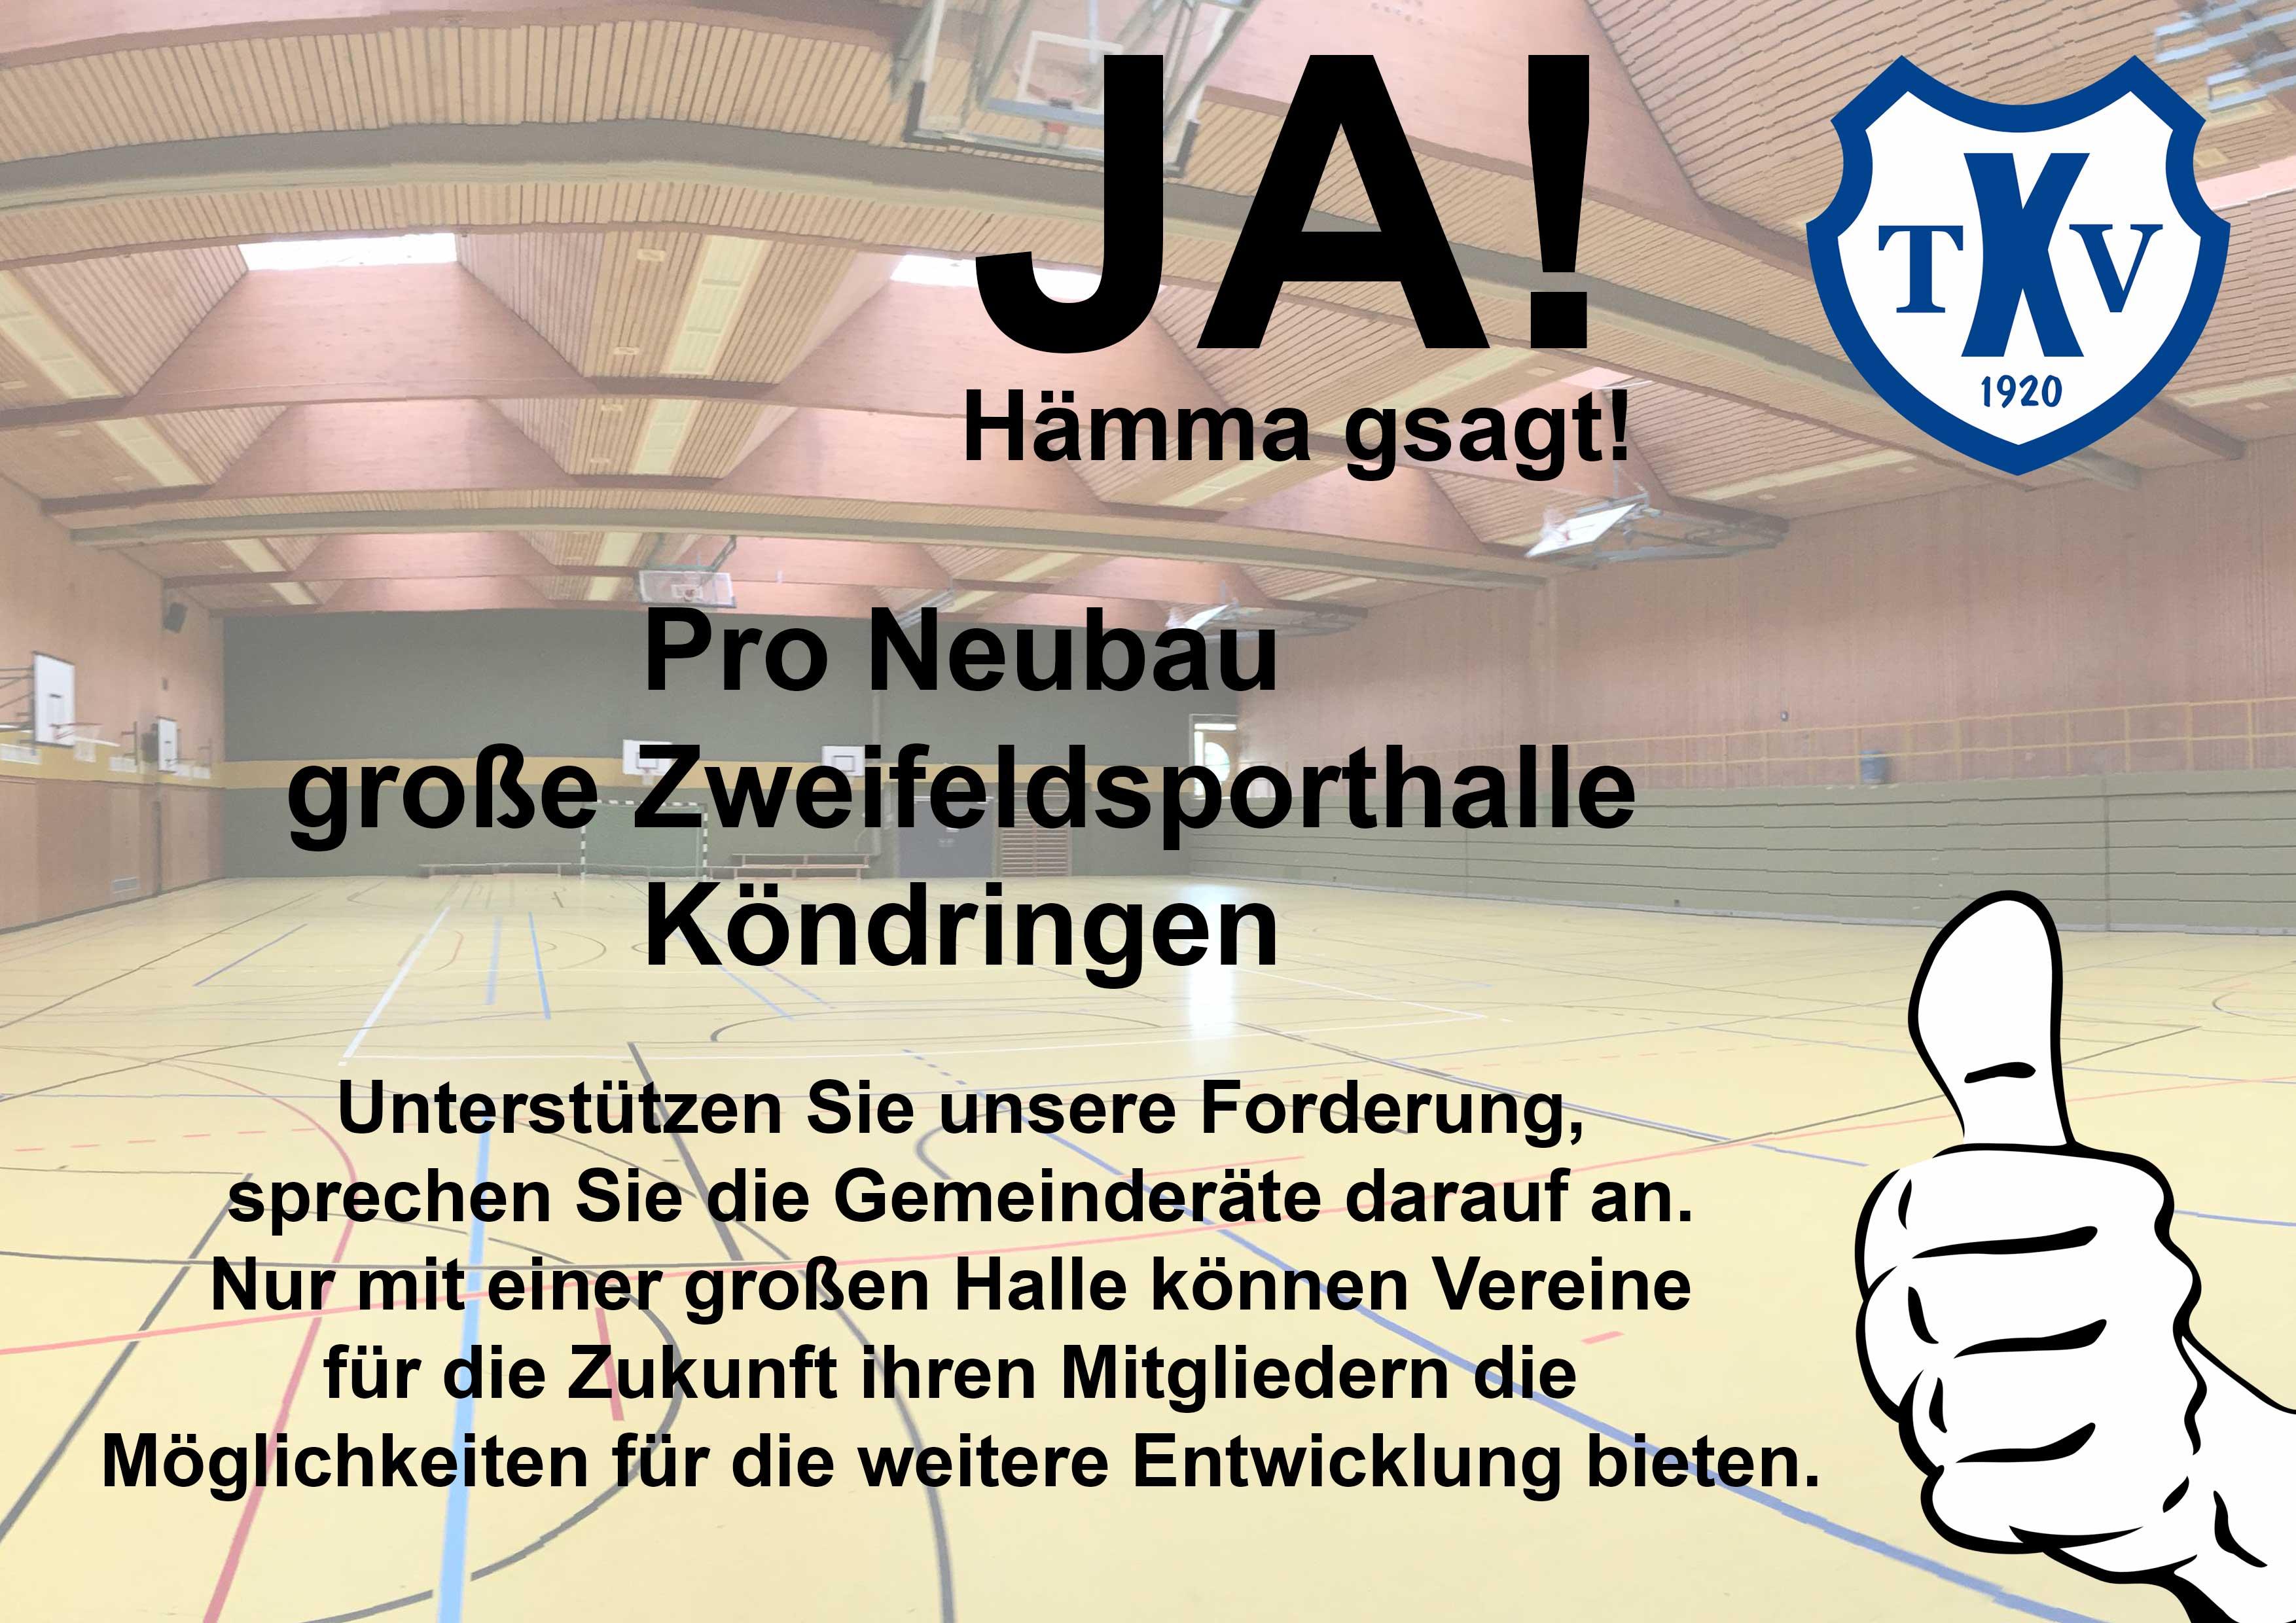 Pro Neubau Zweifeldersporthalle Köndringen